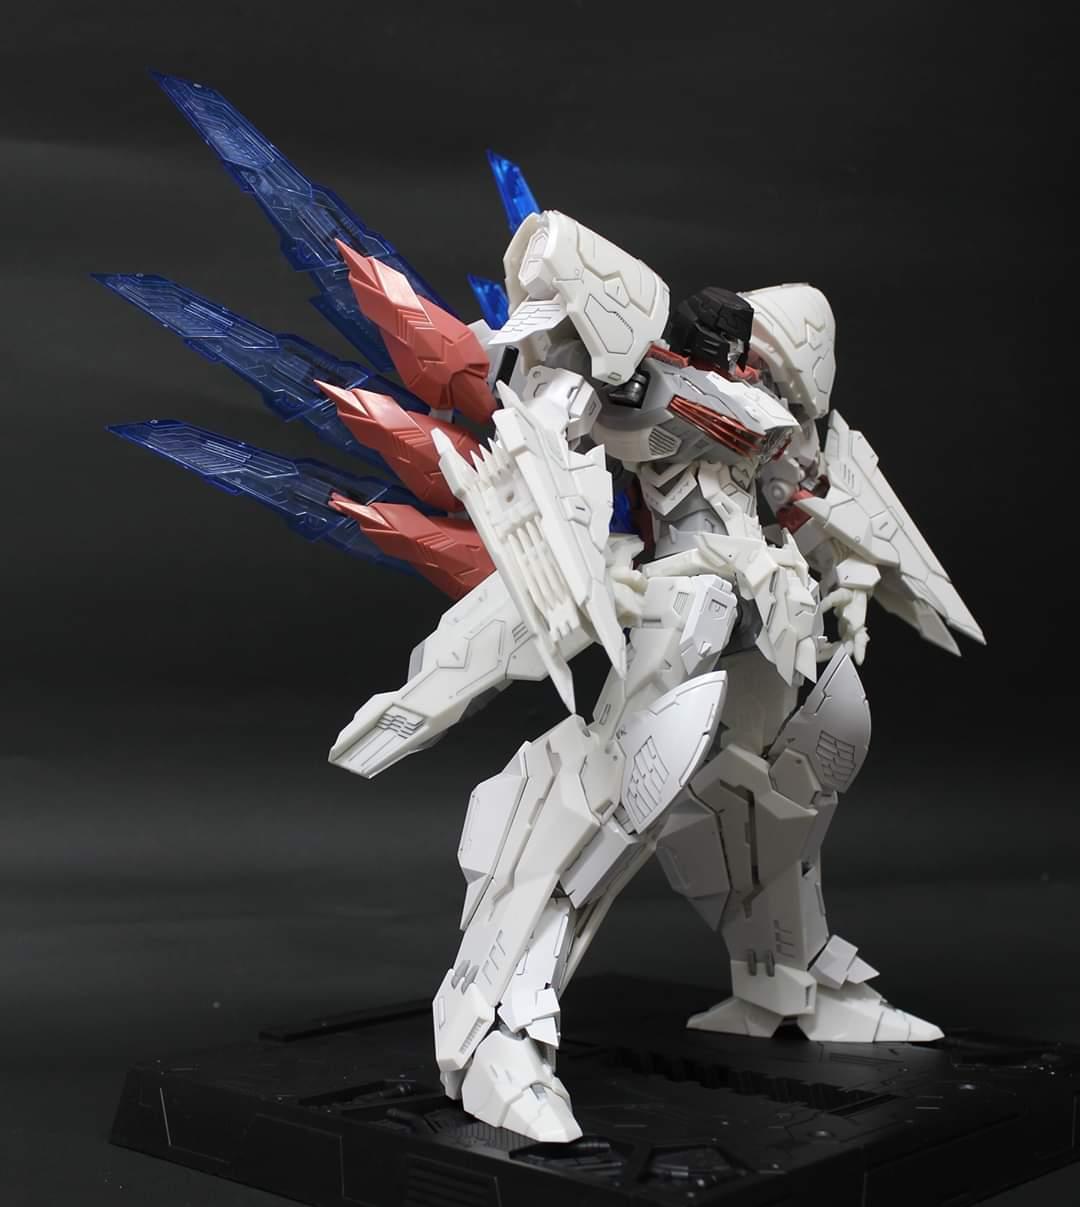 [Flame Toys] Figurines Transformers ― (non transformable - autorisé par Hasbro) - Page 6 K8KSYSjk_o